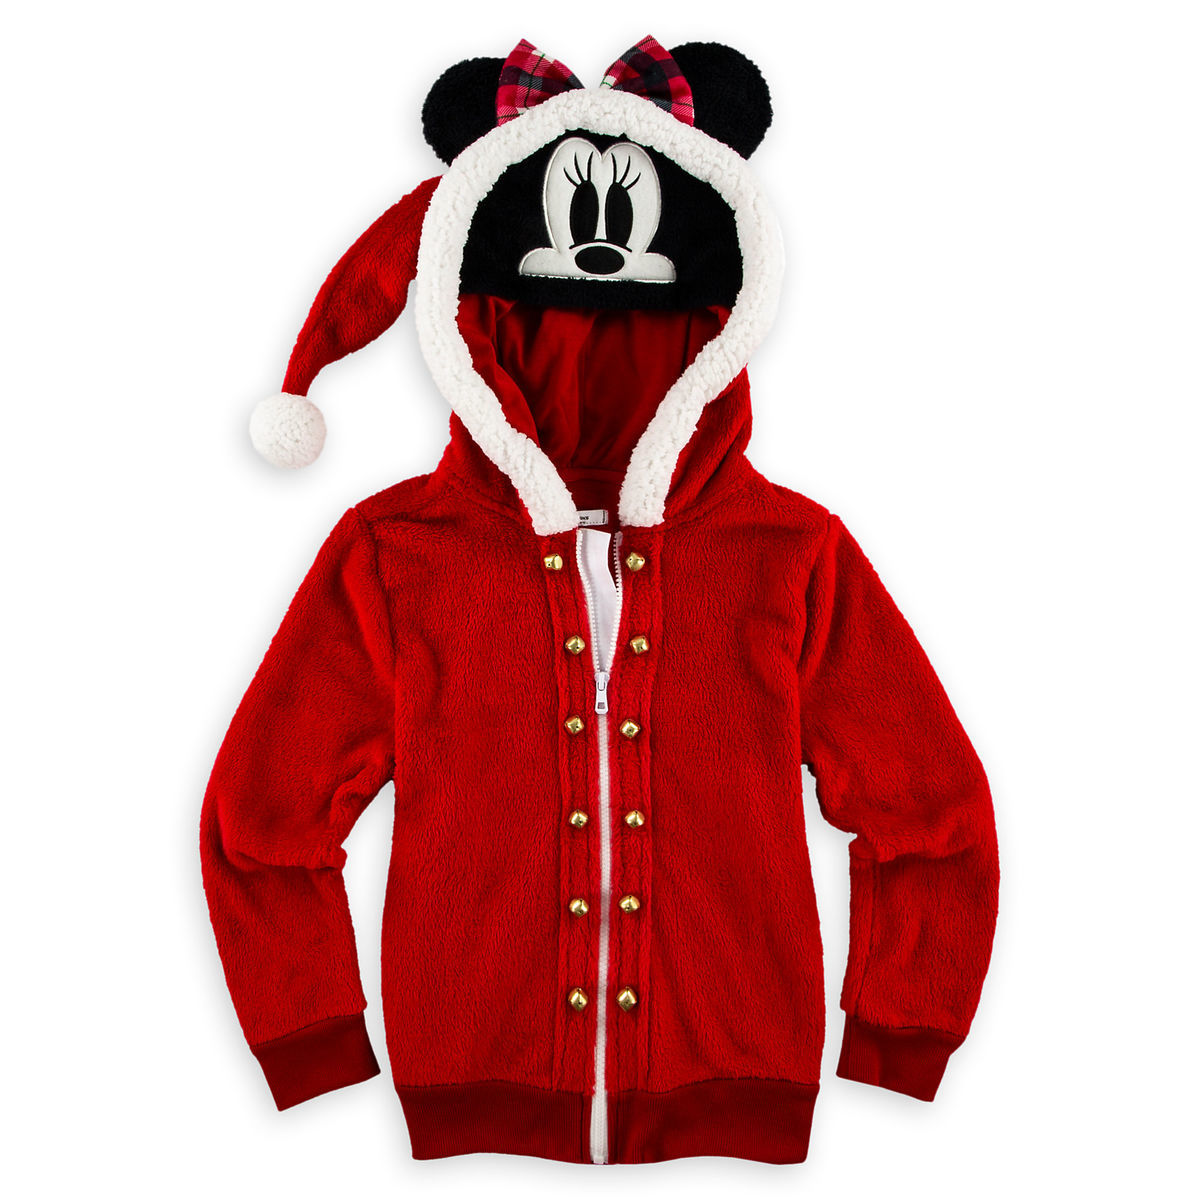 3865ecac9 Disney Jacket for Girls - Holiday Santa Minnie Mouse - Hooded Fleece